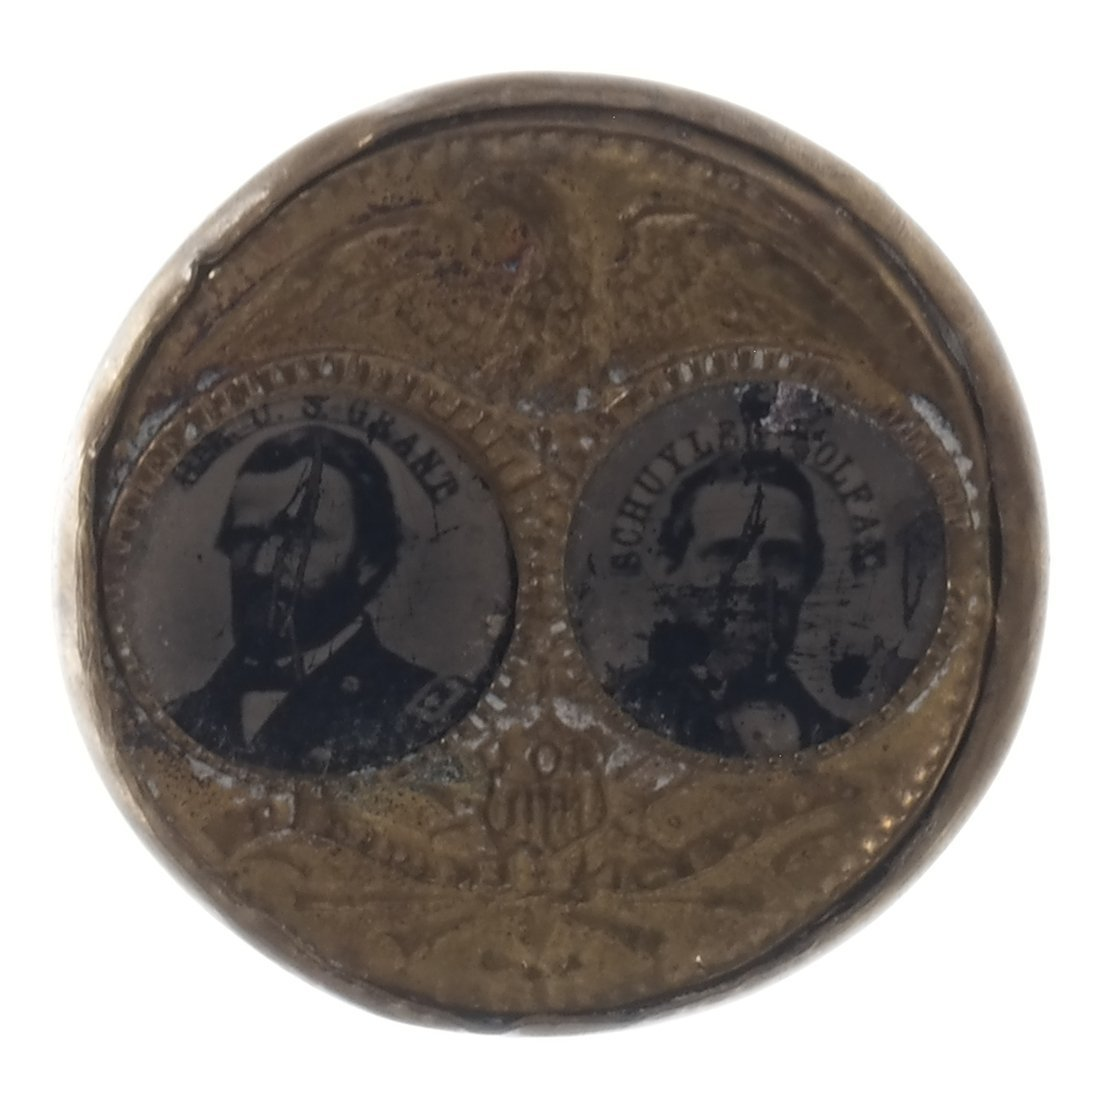 Grant & Colfax Two 1868 Jugate Ferrotypes - 3